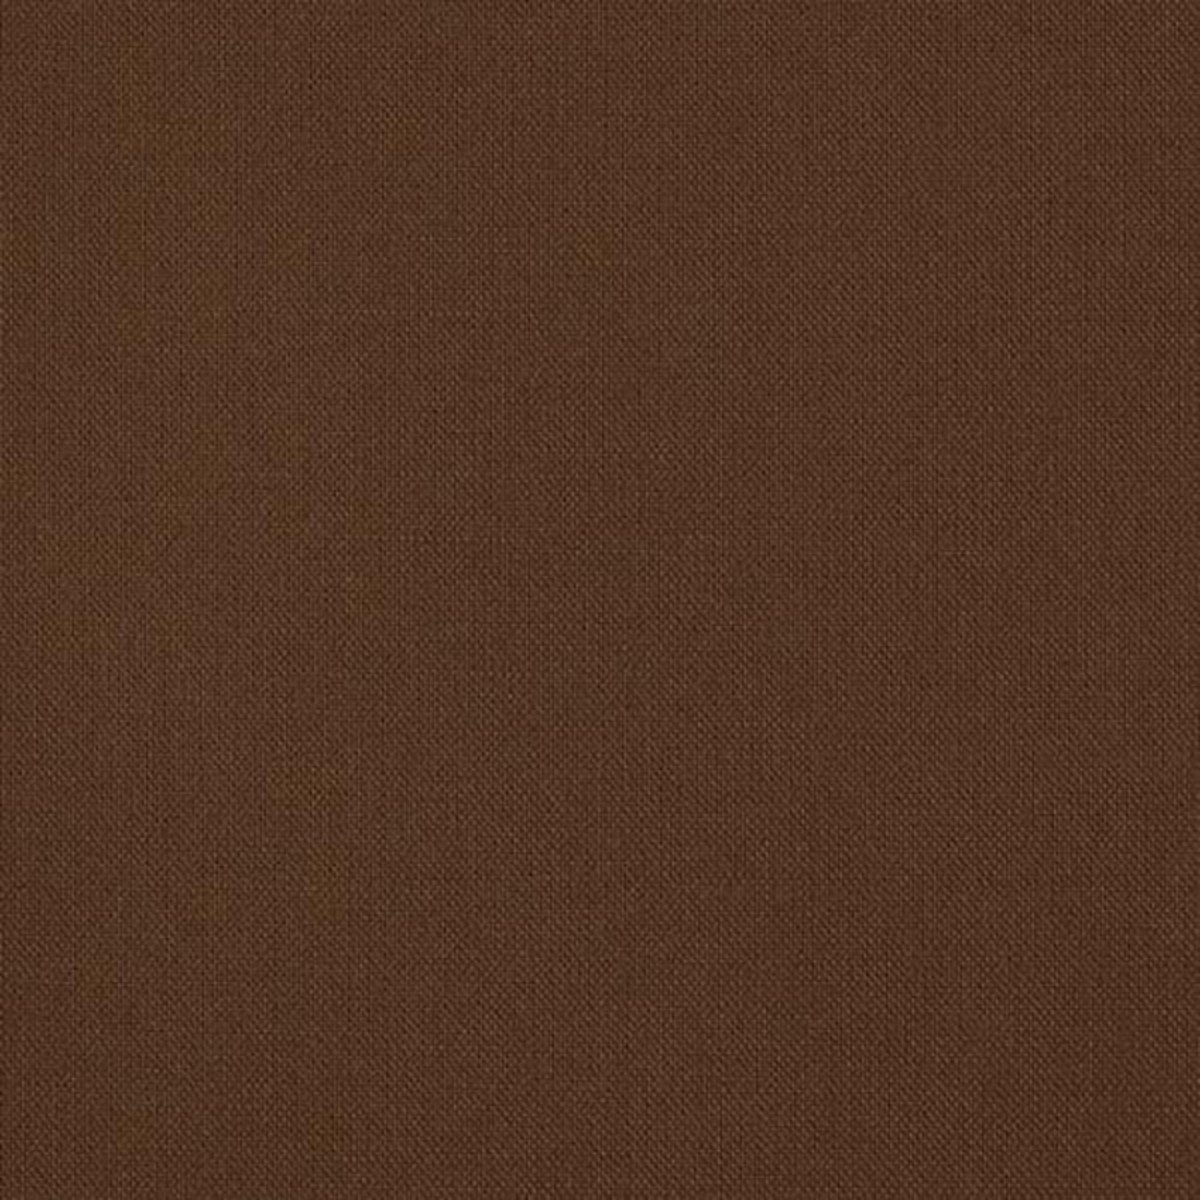 Kona Cotton - Coffee (1083)